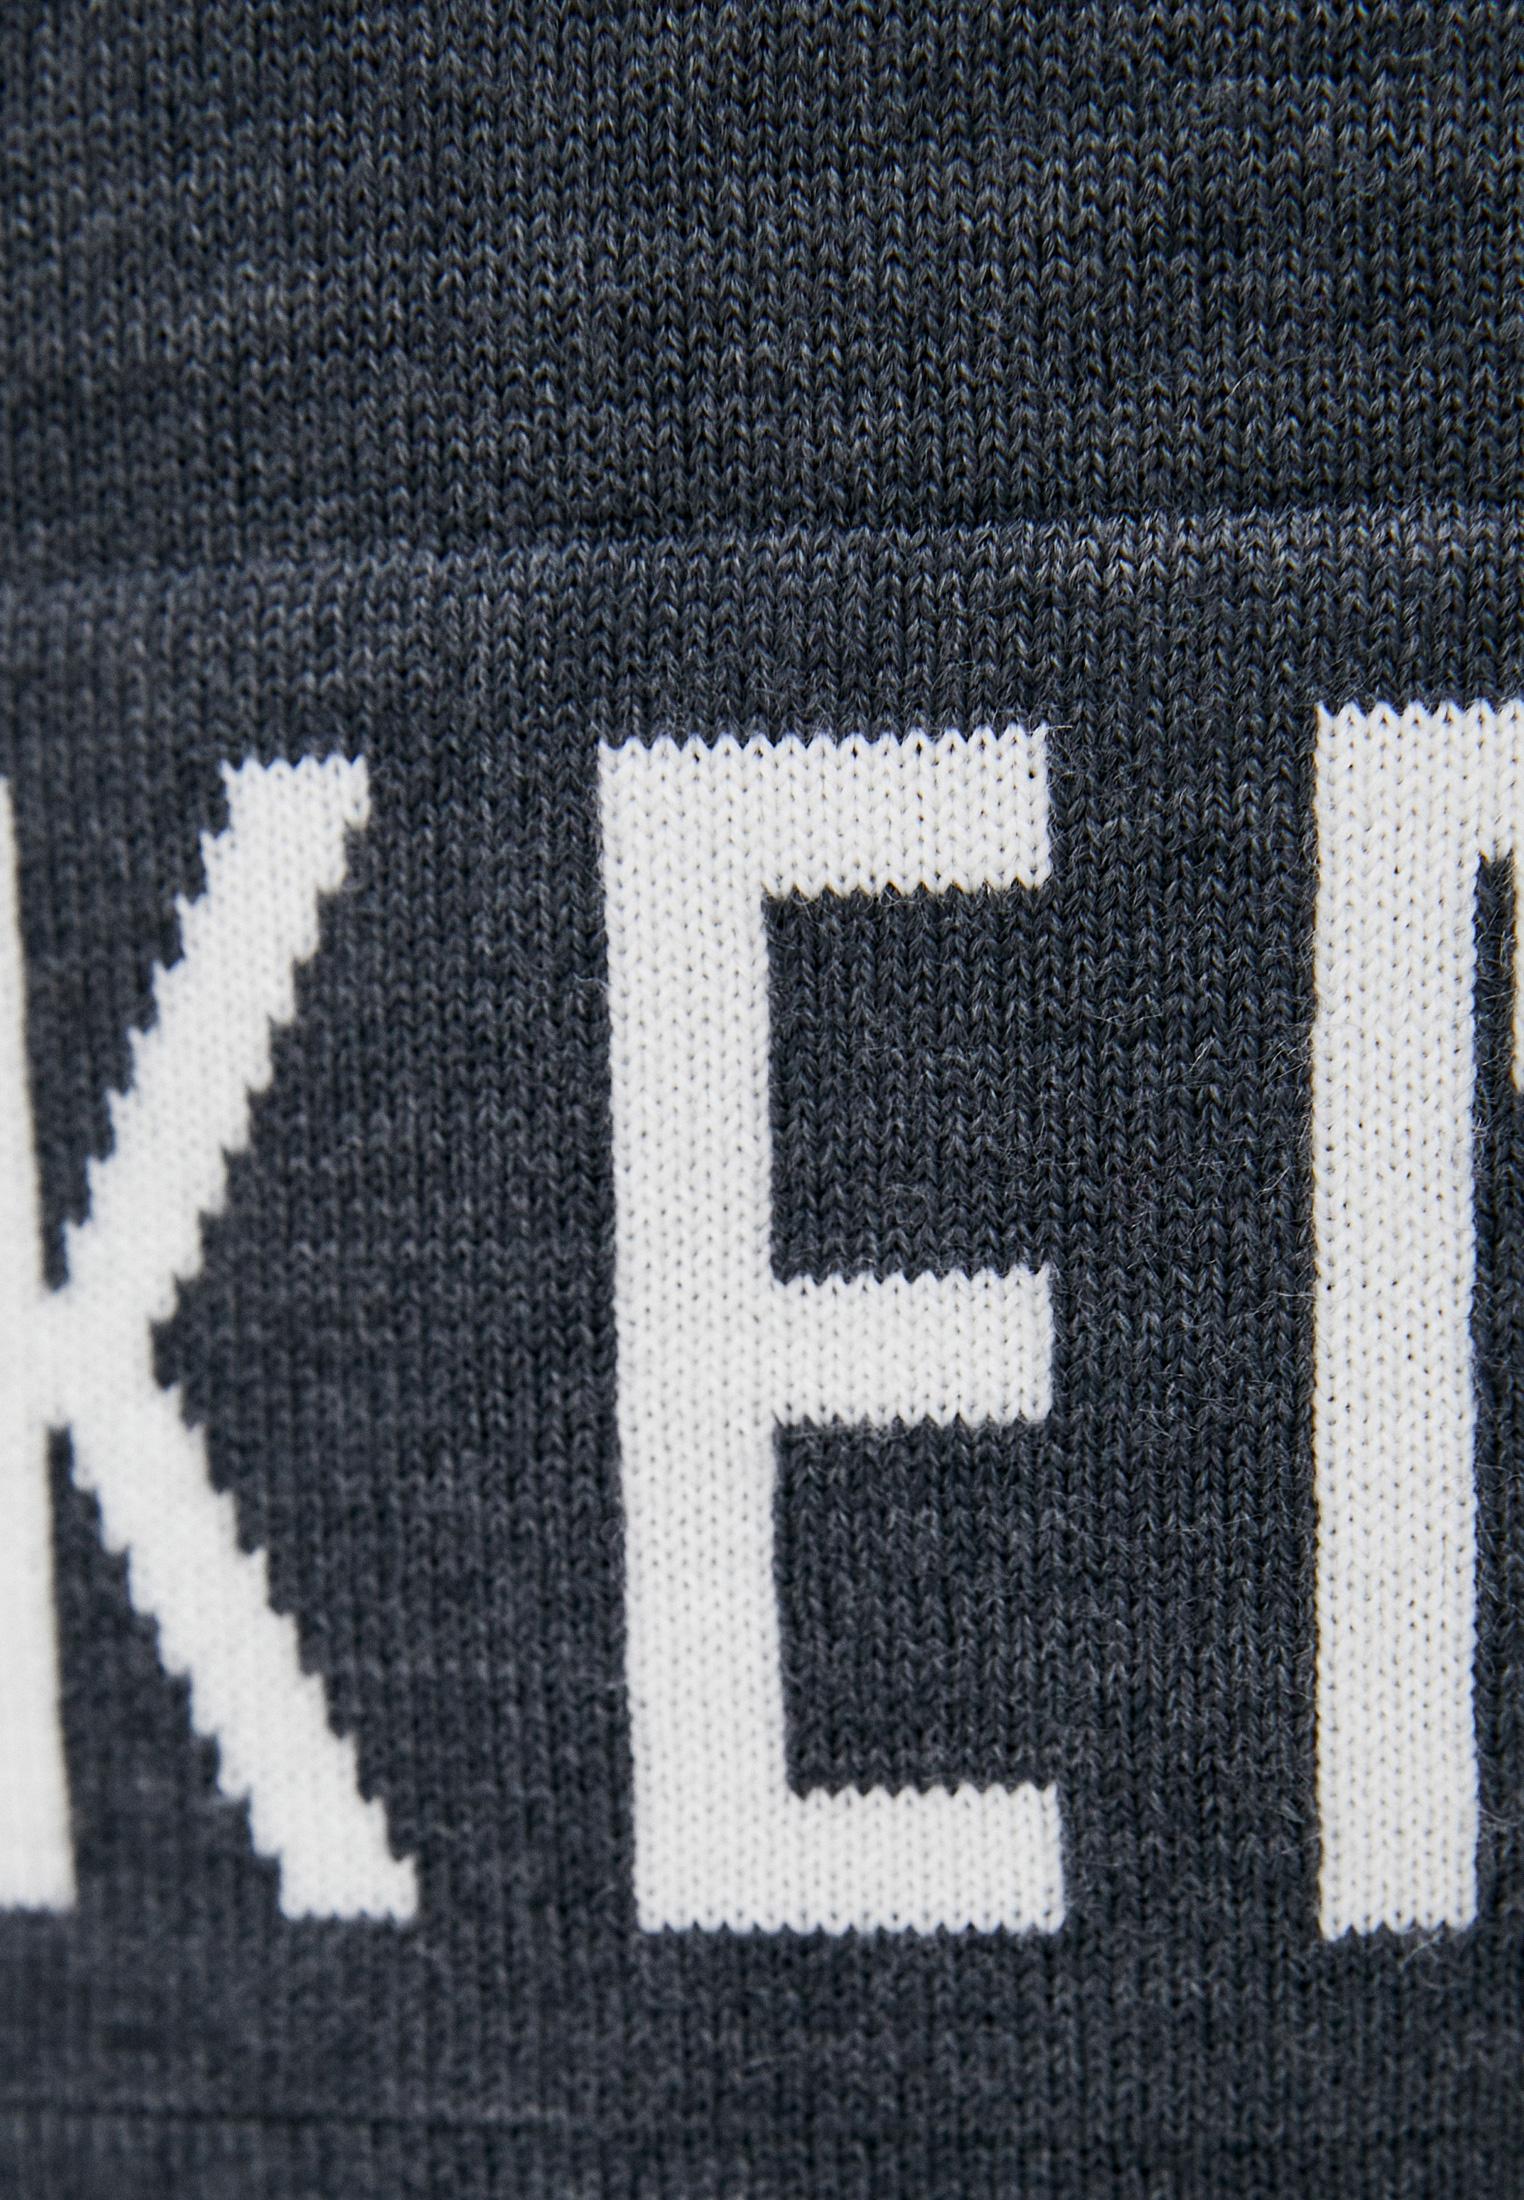 Джемпер Bikkembergs (Биккембергс) c s g83 10 x 1306: изображение 5